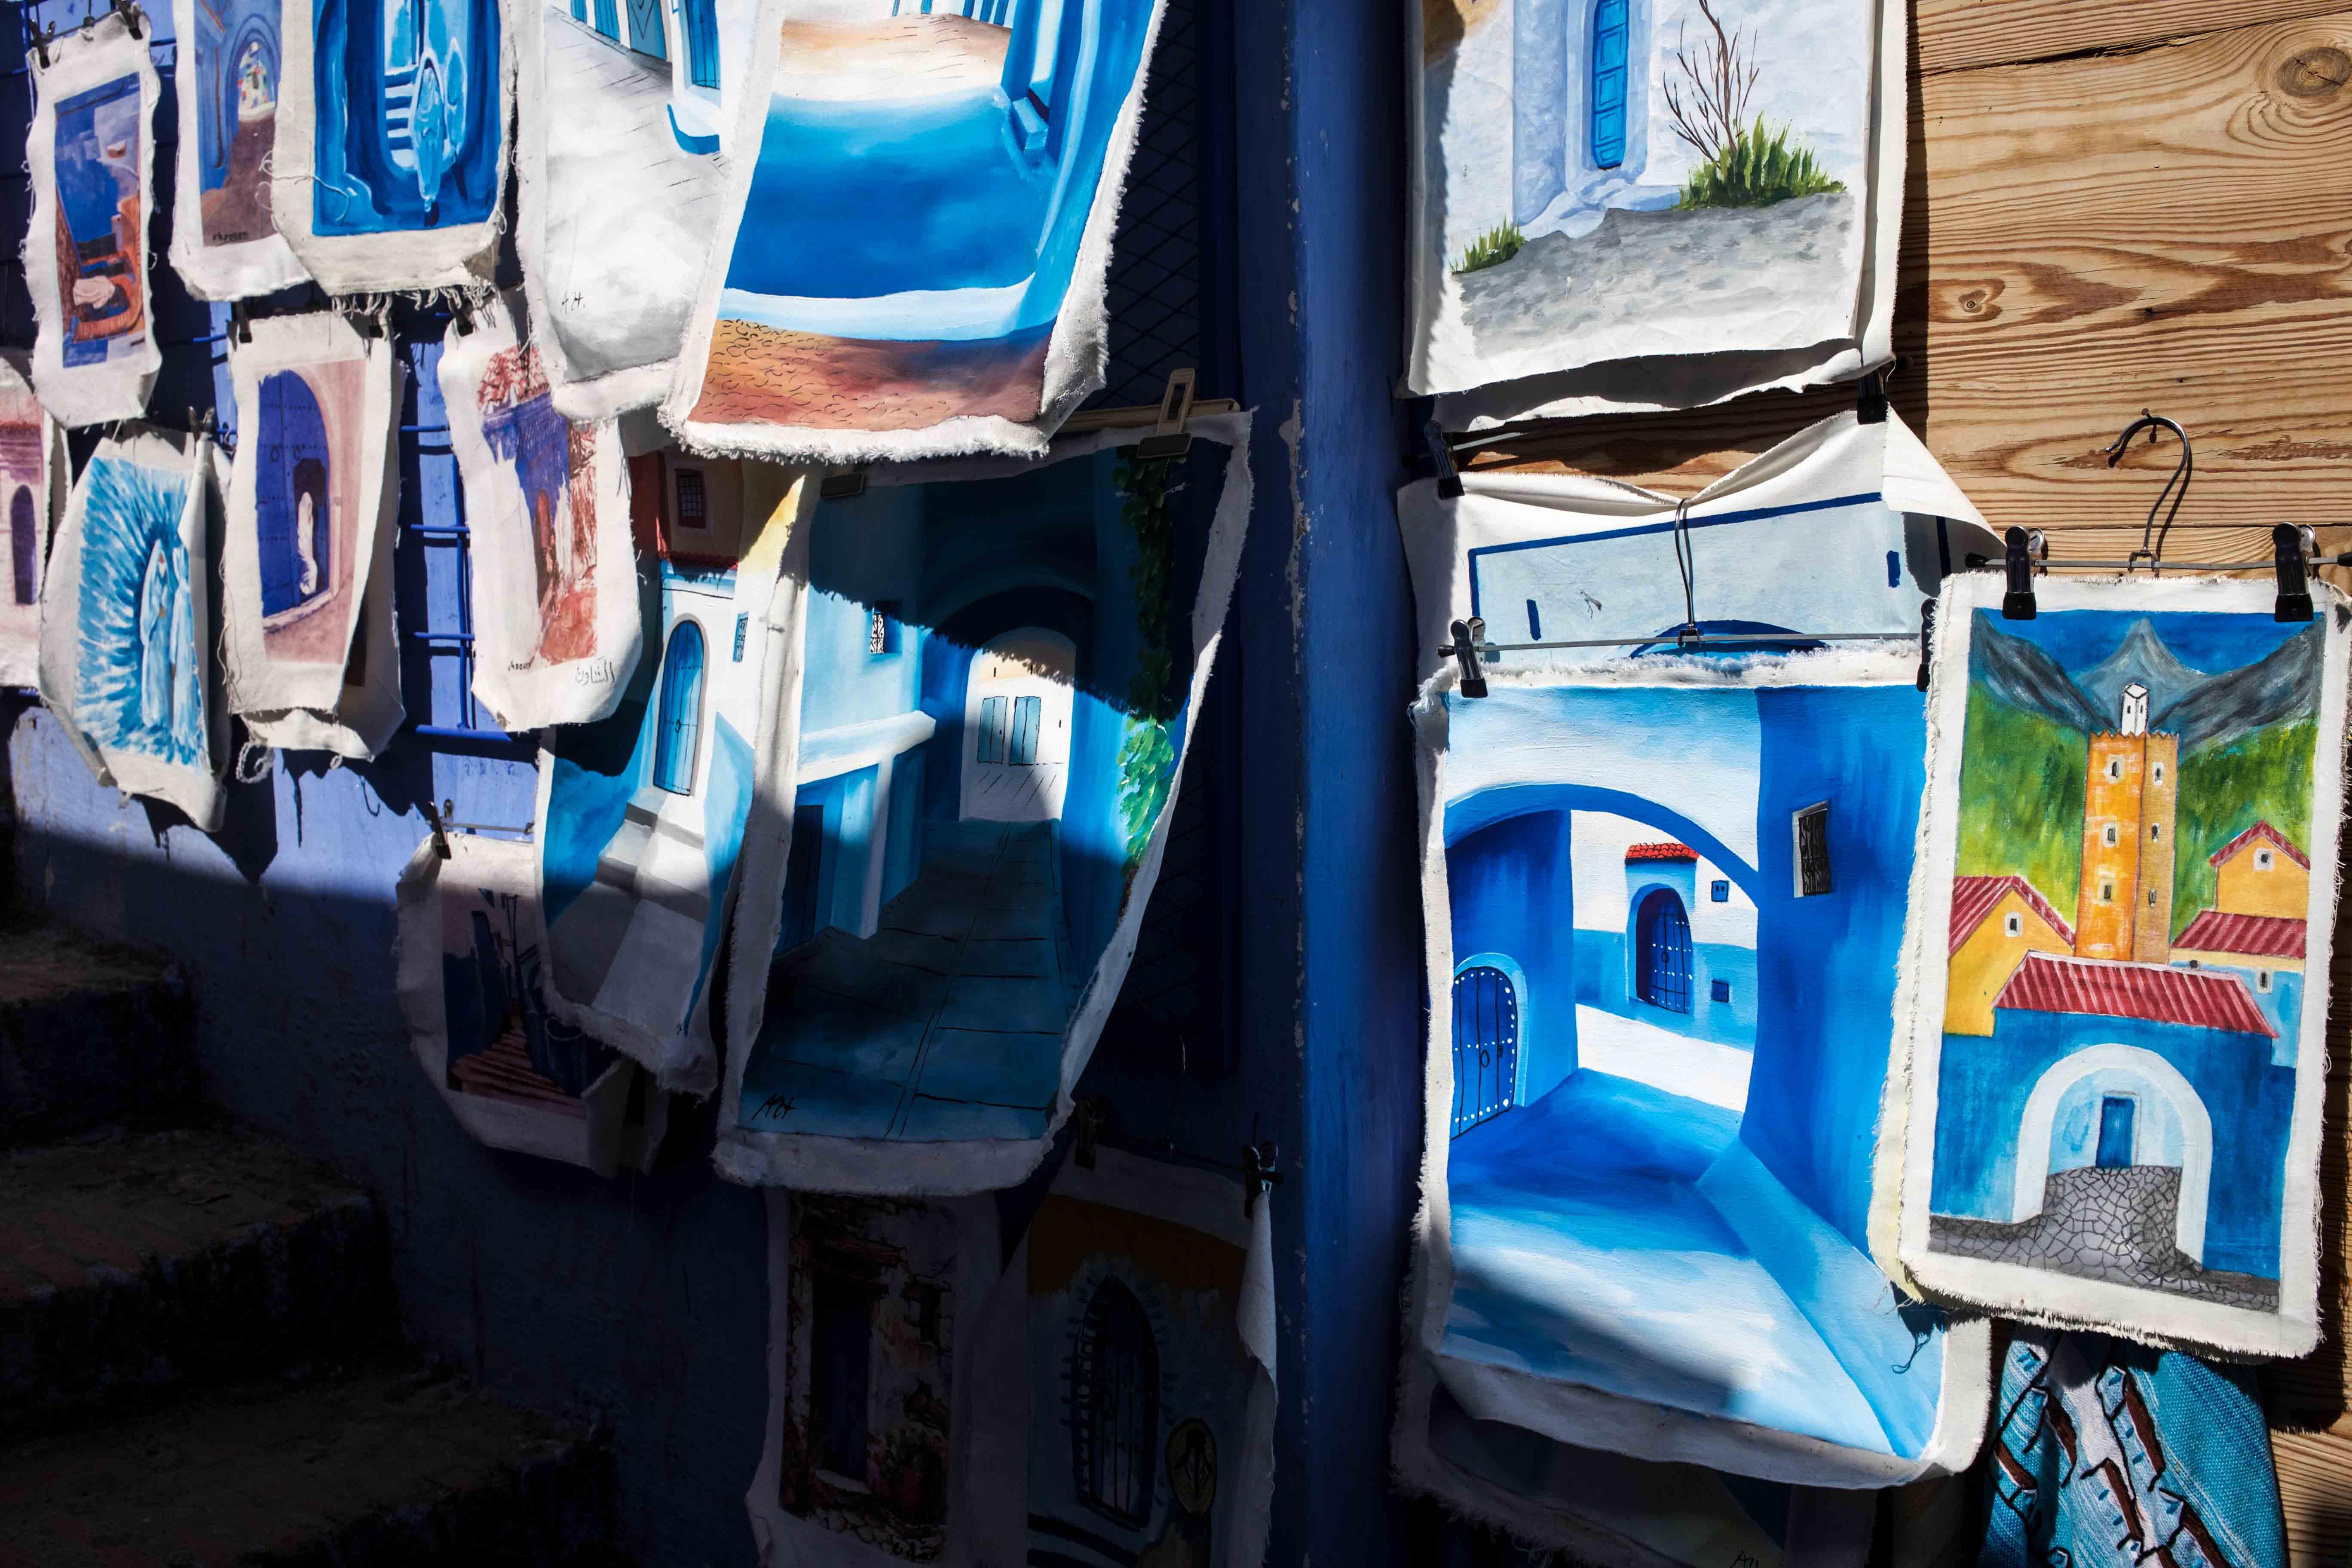 bus-tour-spanien-marokko-gibraltar-reiseblog-travelblog-reiseübelkeit-tipps-road-trip_8008